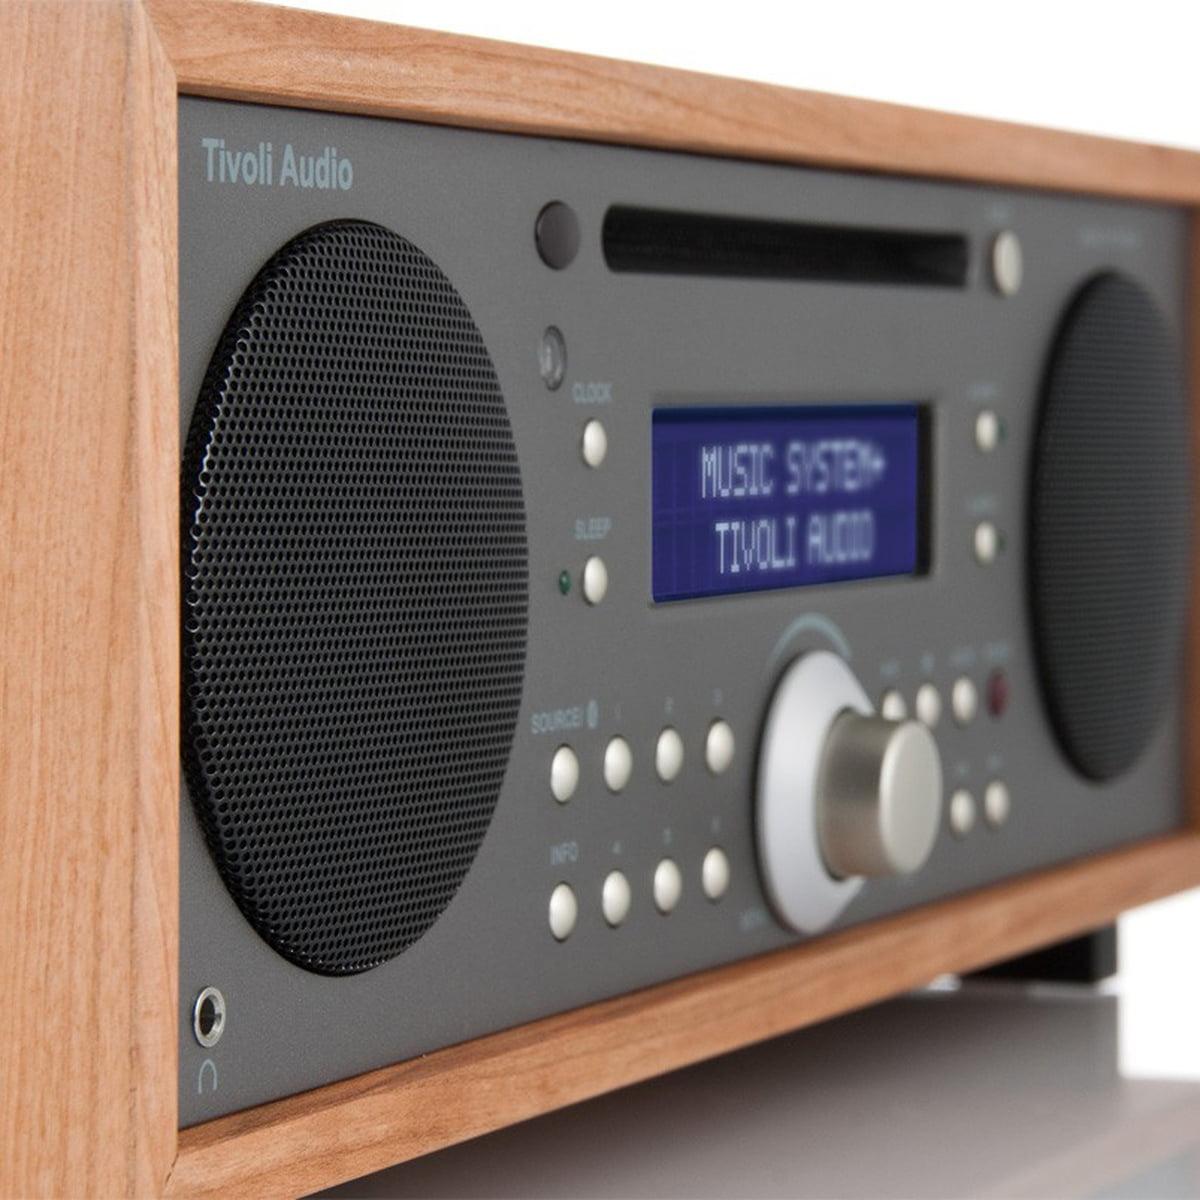 musiksystemet music system fra tivoli audio f s i interi rshoppen. Black Bedroom Furniture Sets. Home Design Ideas